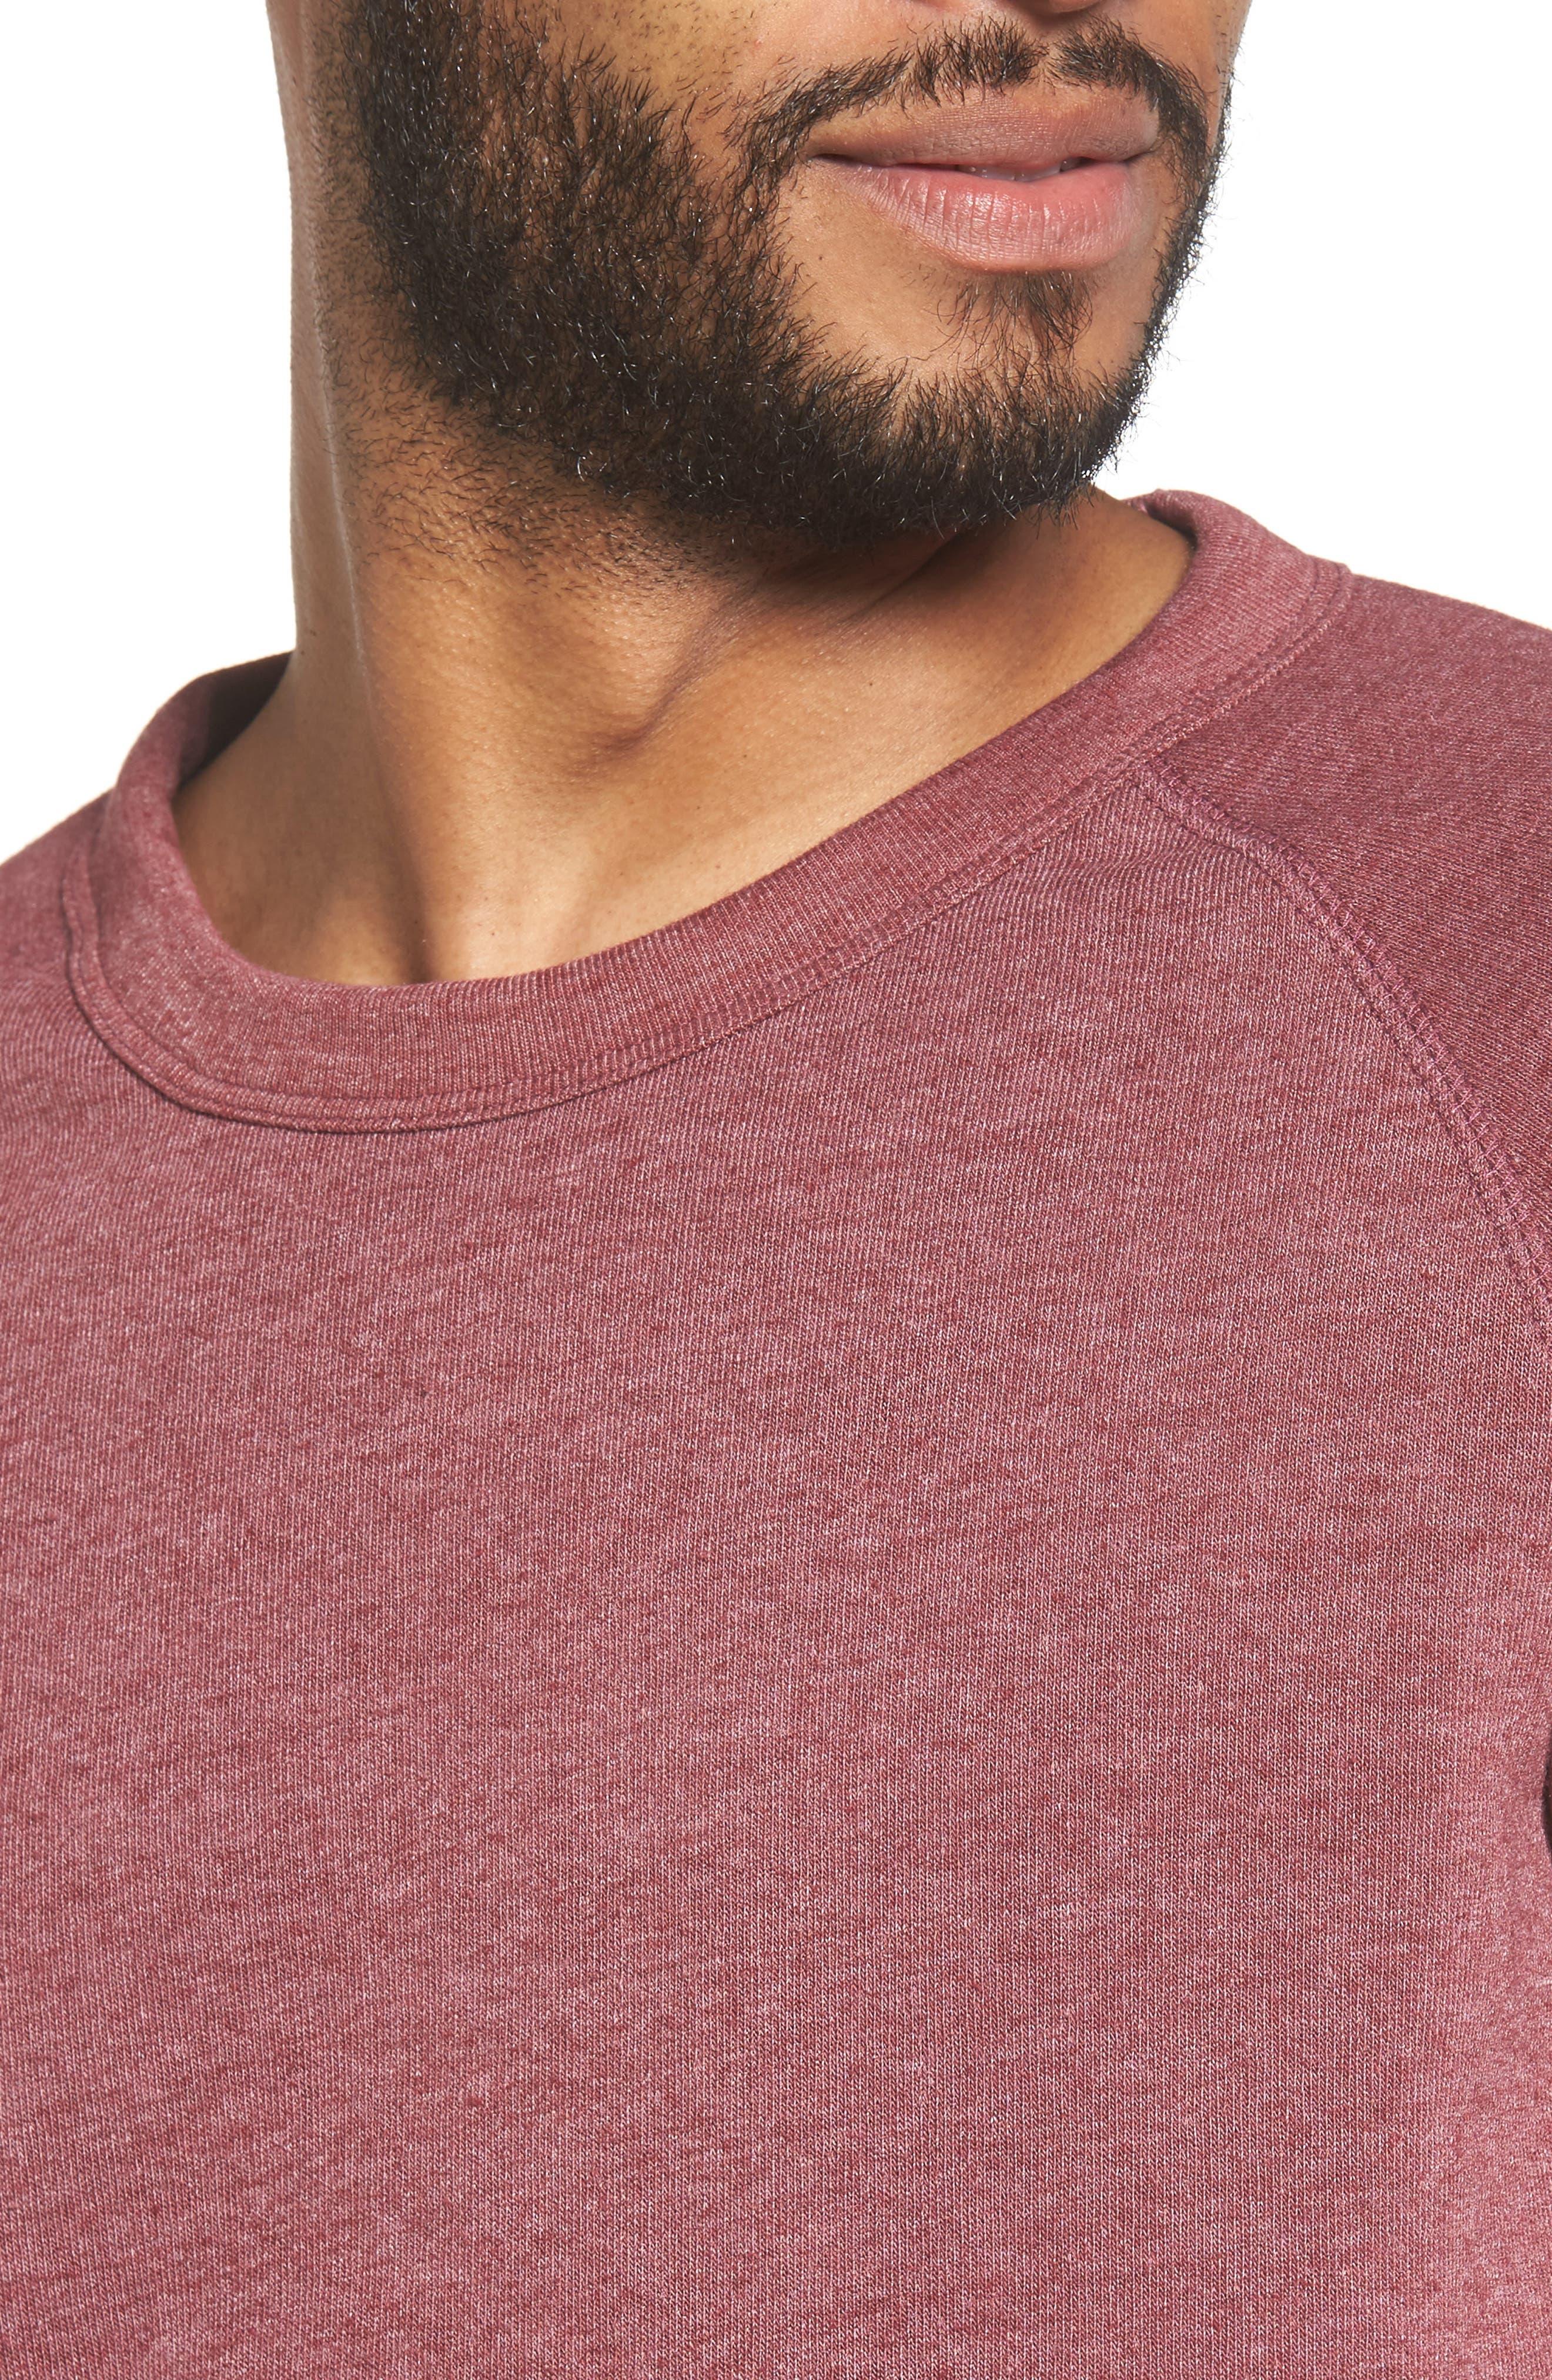 'The Champ' Sweatshirt,                             Alternate thumbnail 34, color,